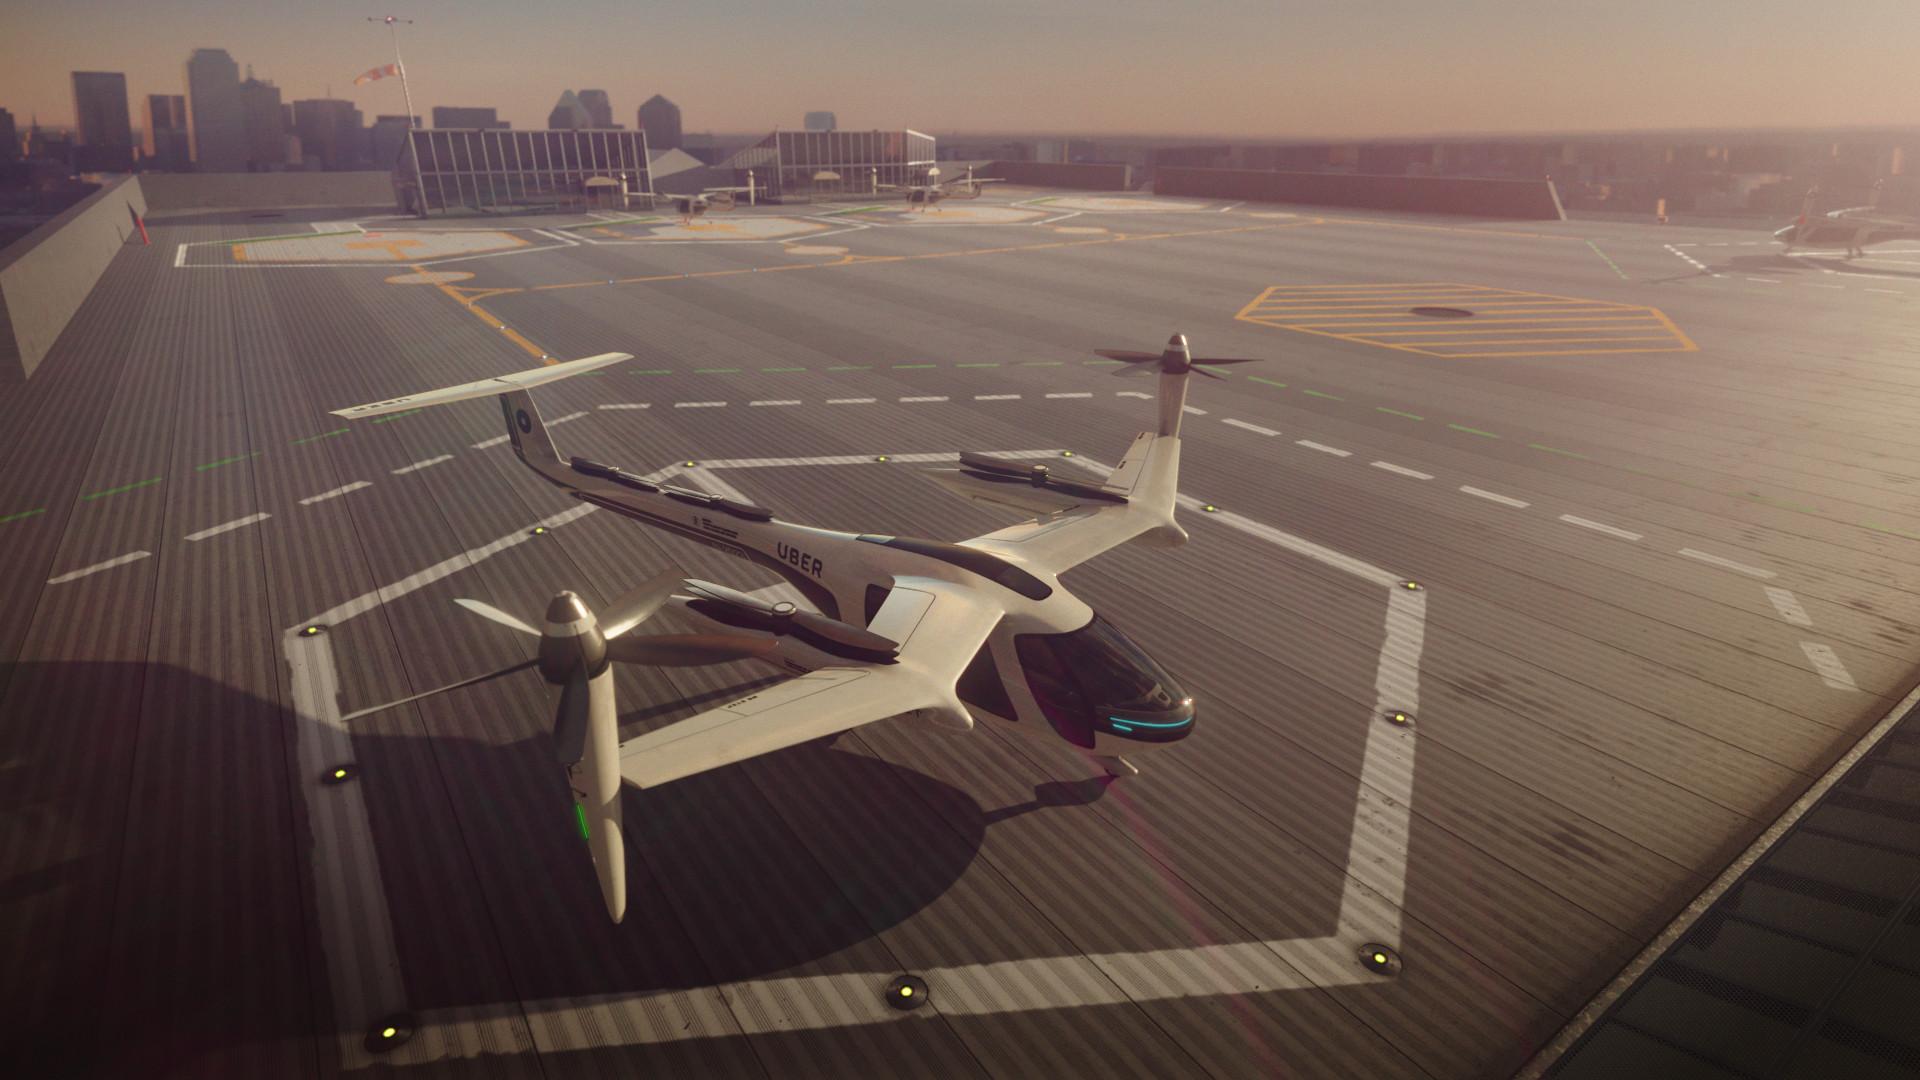 uber flying cars 2020 in dallas